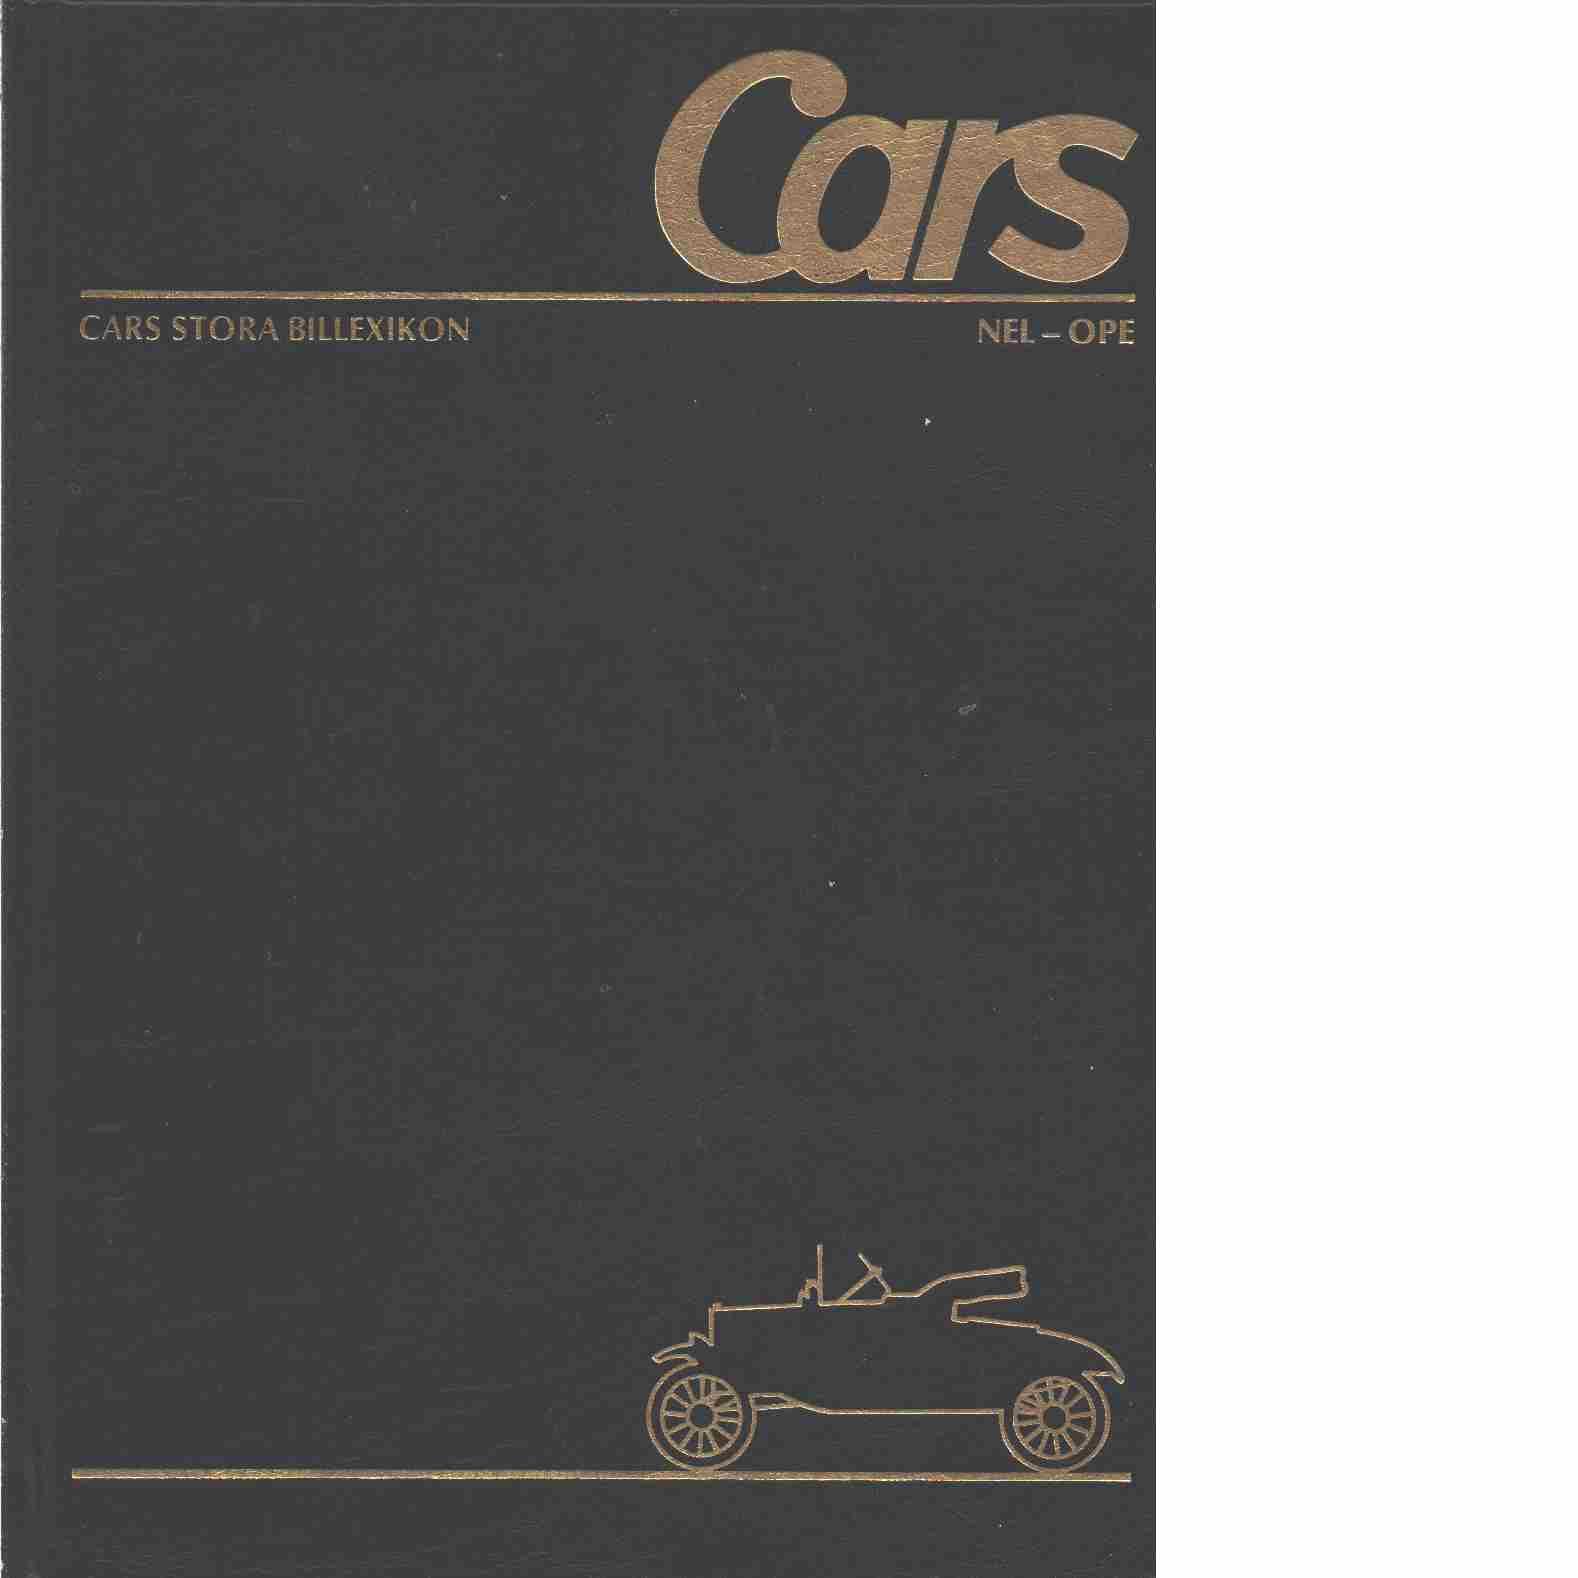 Cars stora billexikon. 26, Nelson-Opel  - Red.